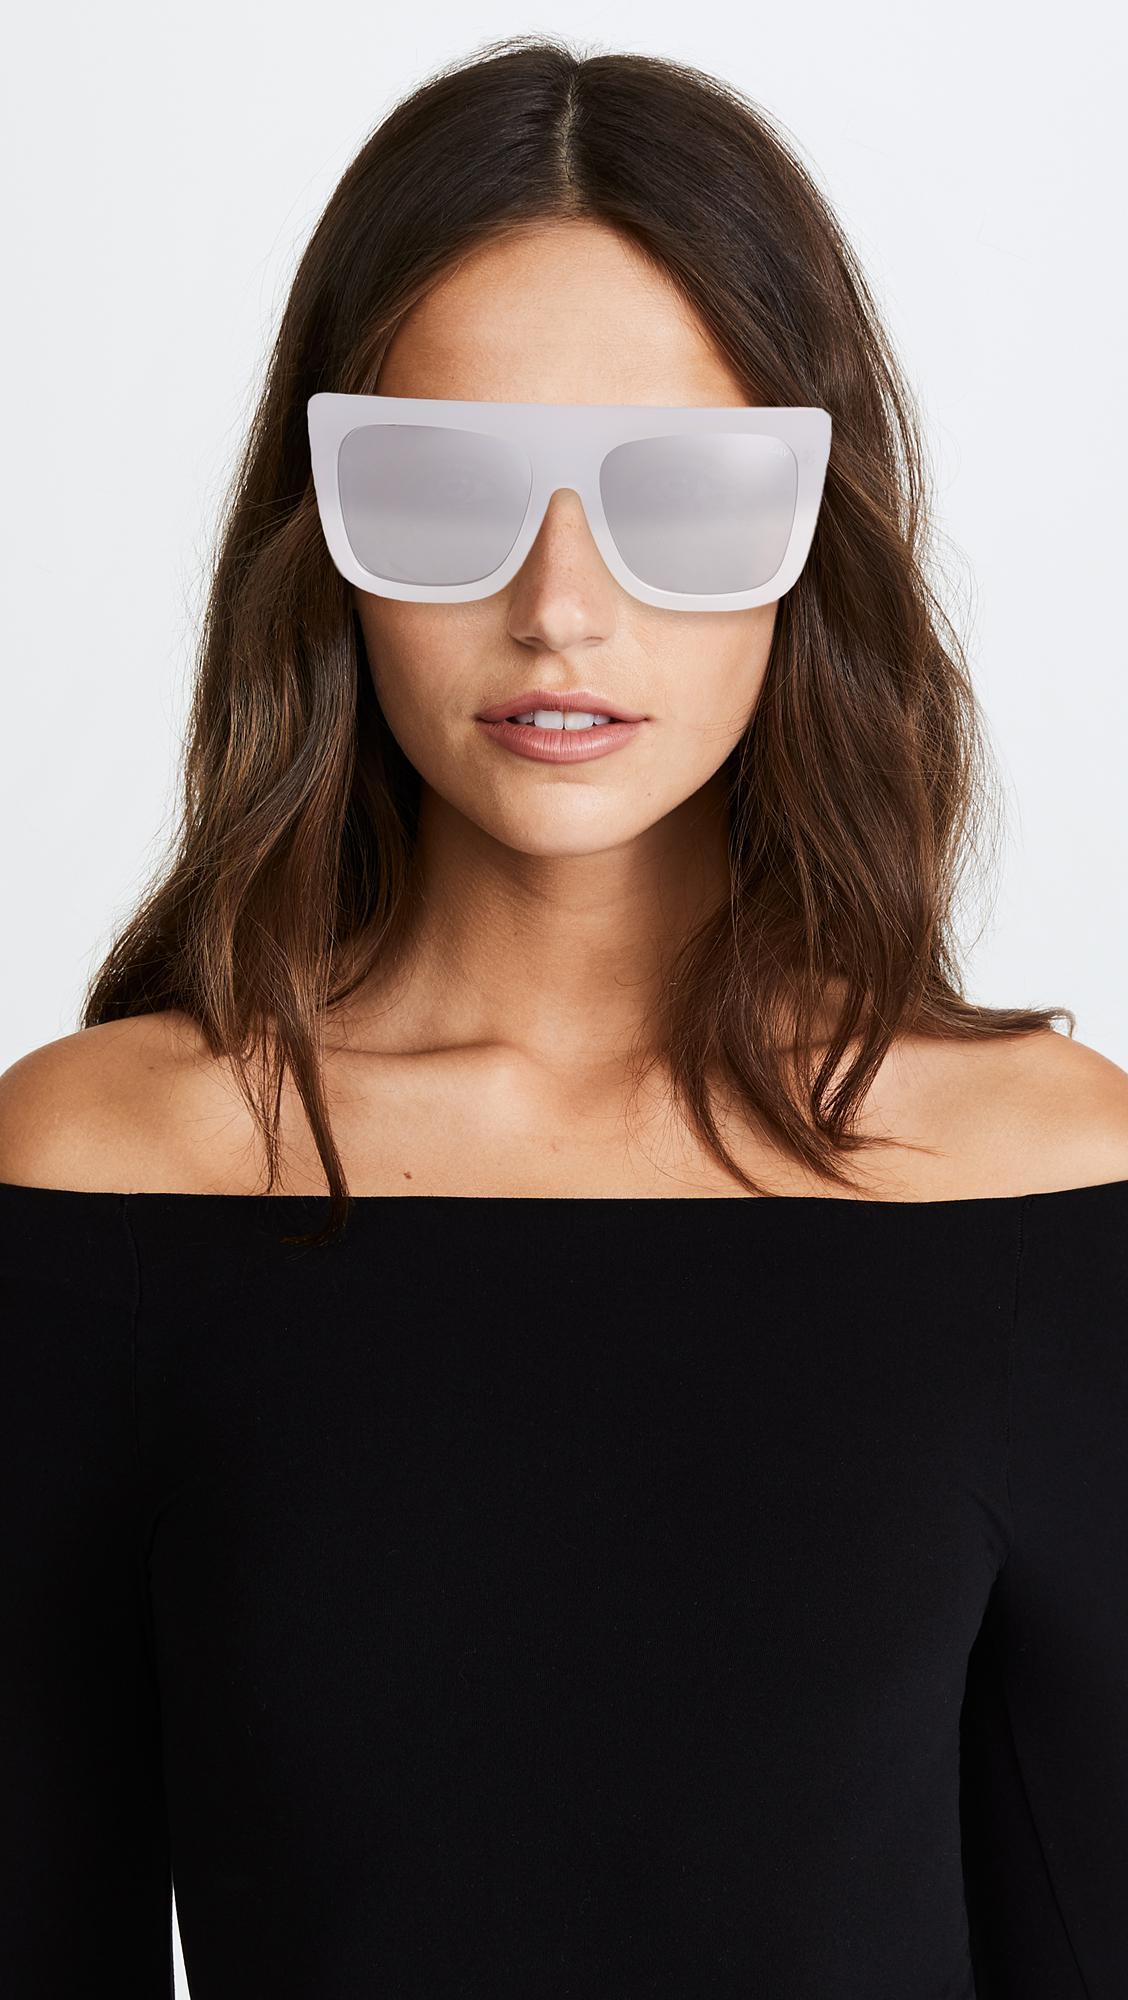 df2b42da96 Quay Cafe Racer Sunglasses in White - Lyst